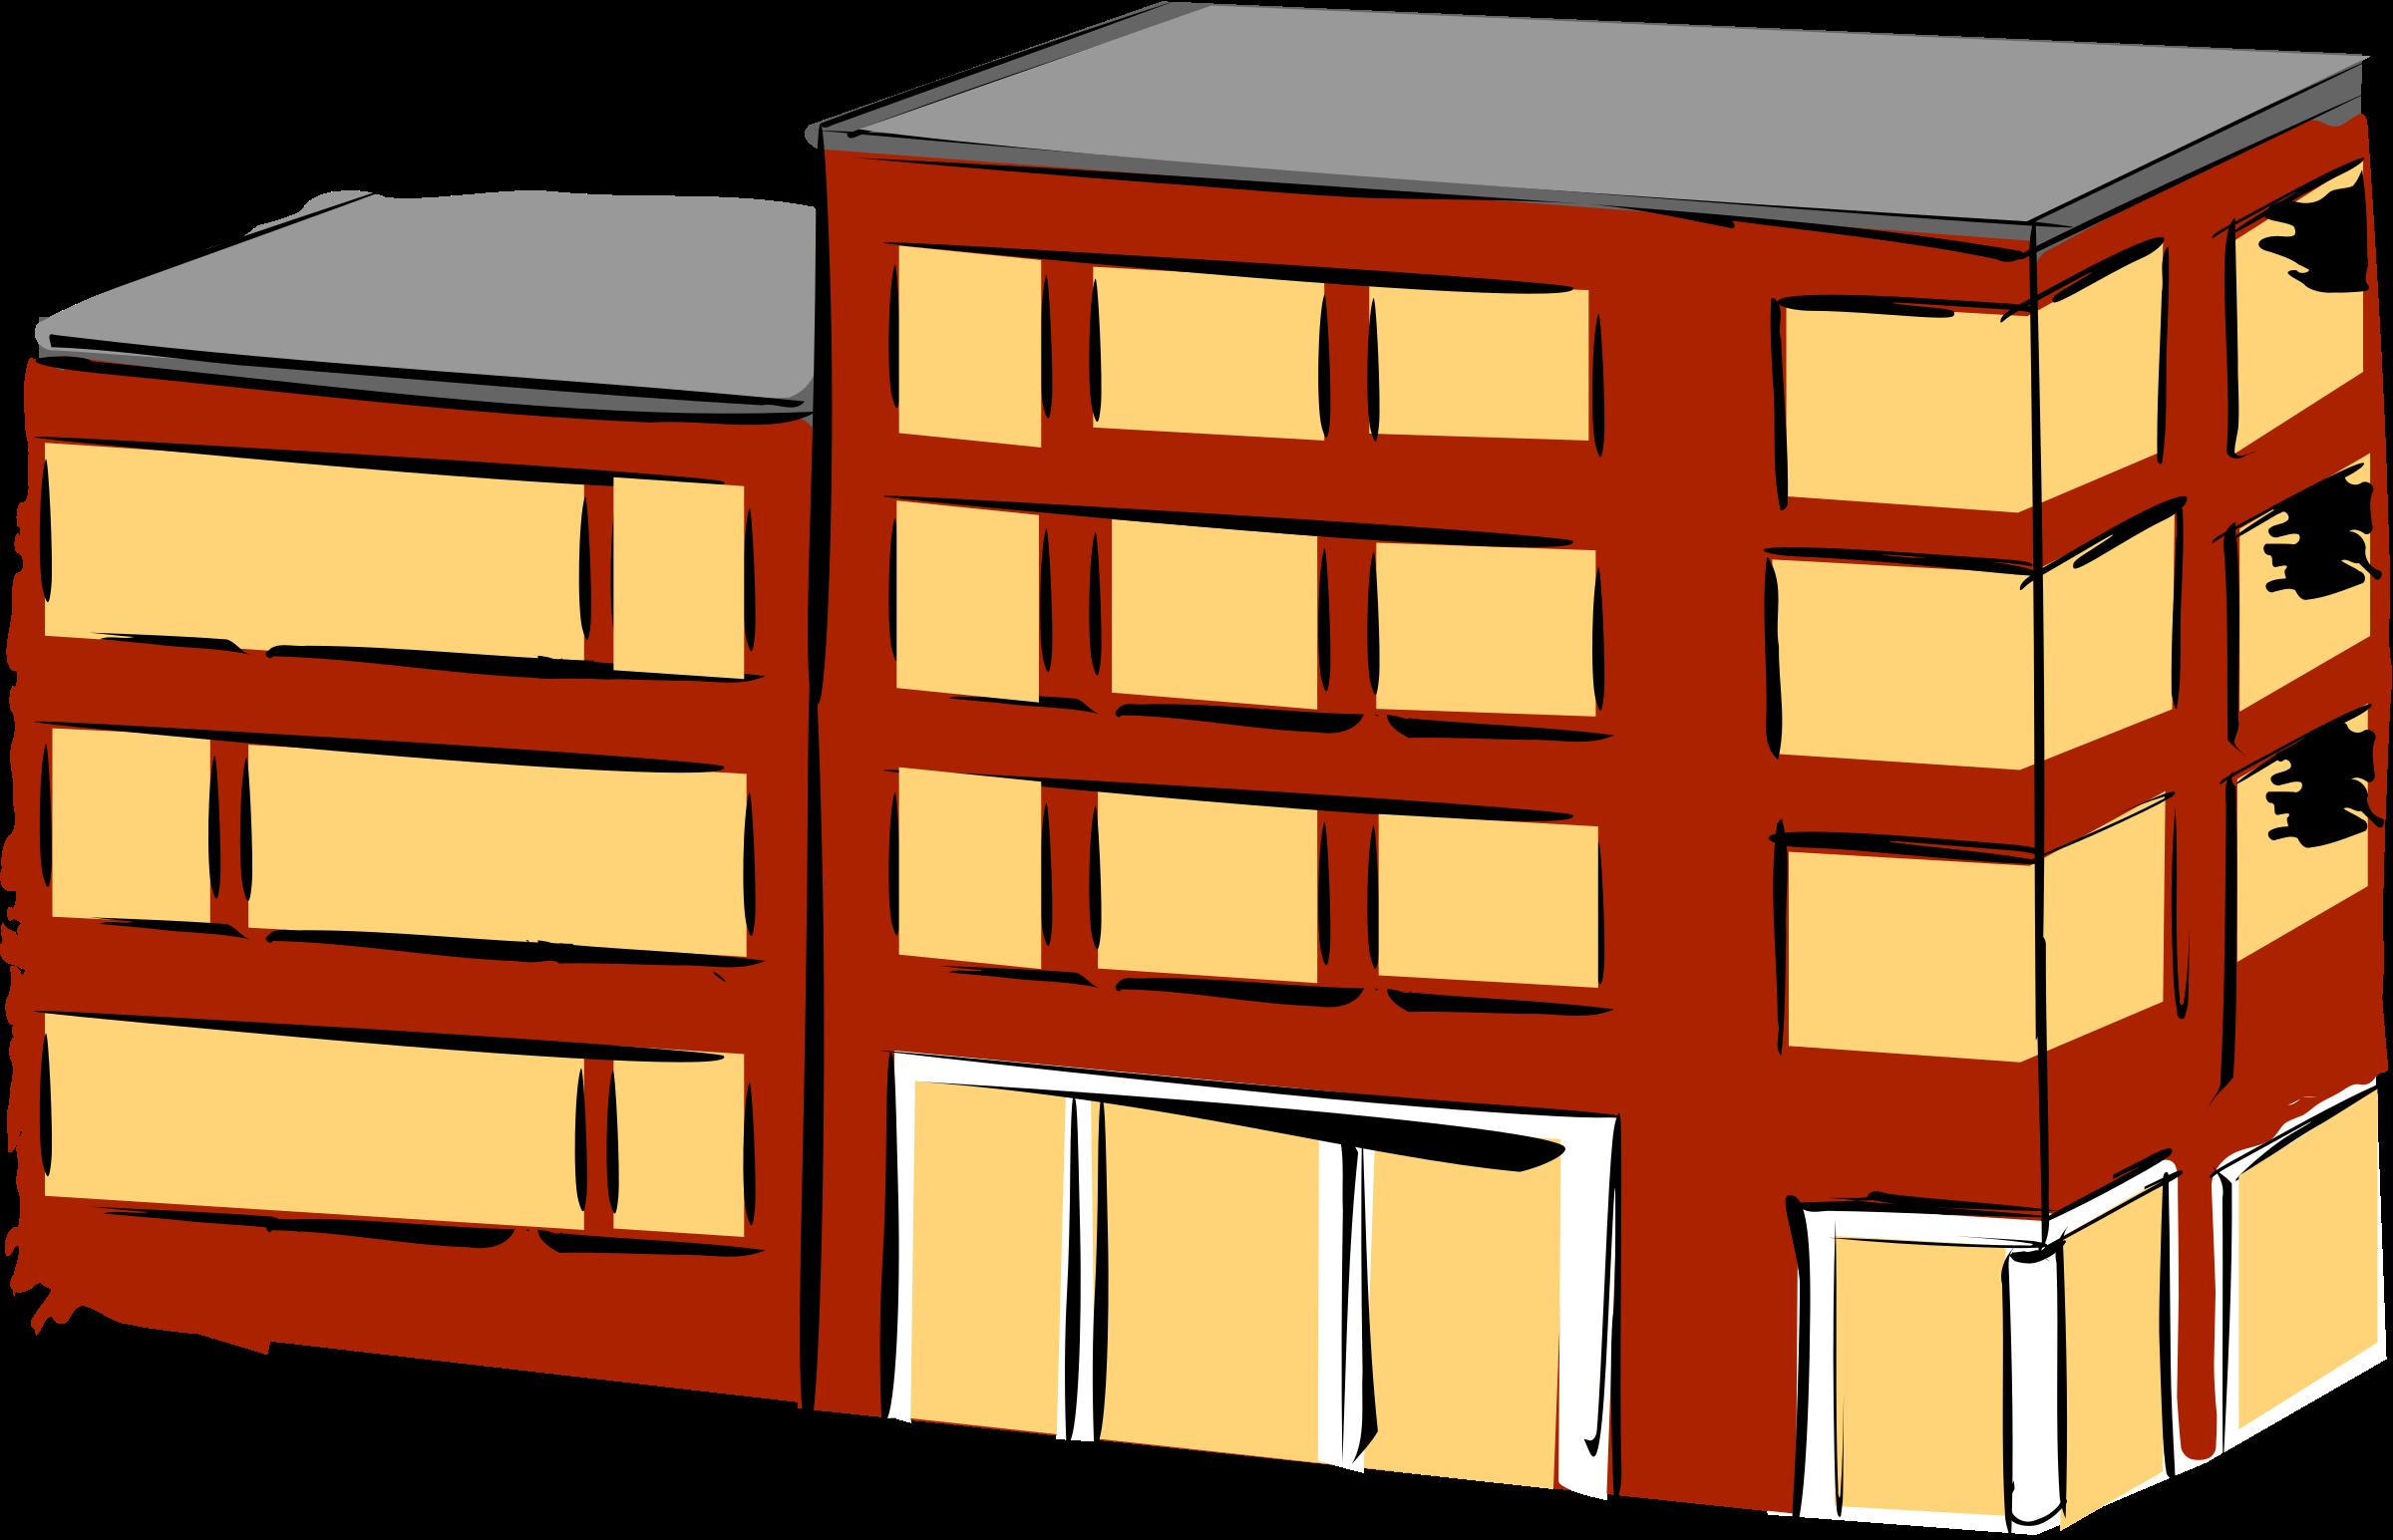 Building big image png. Apartment clipart small apartment